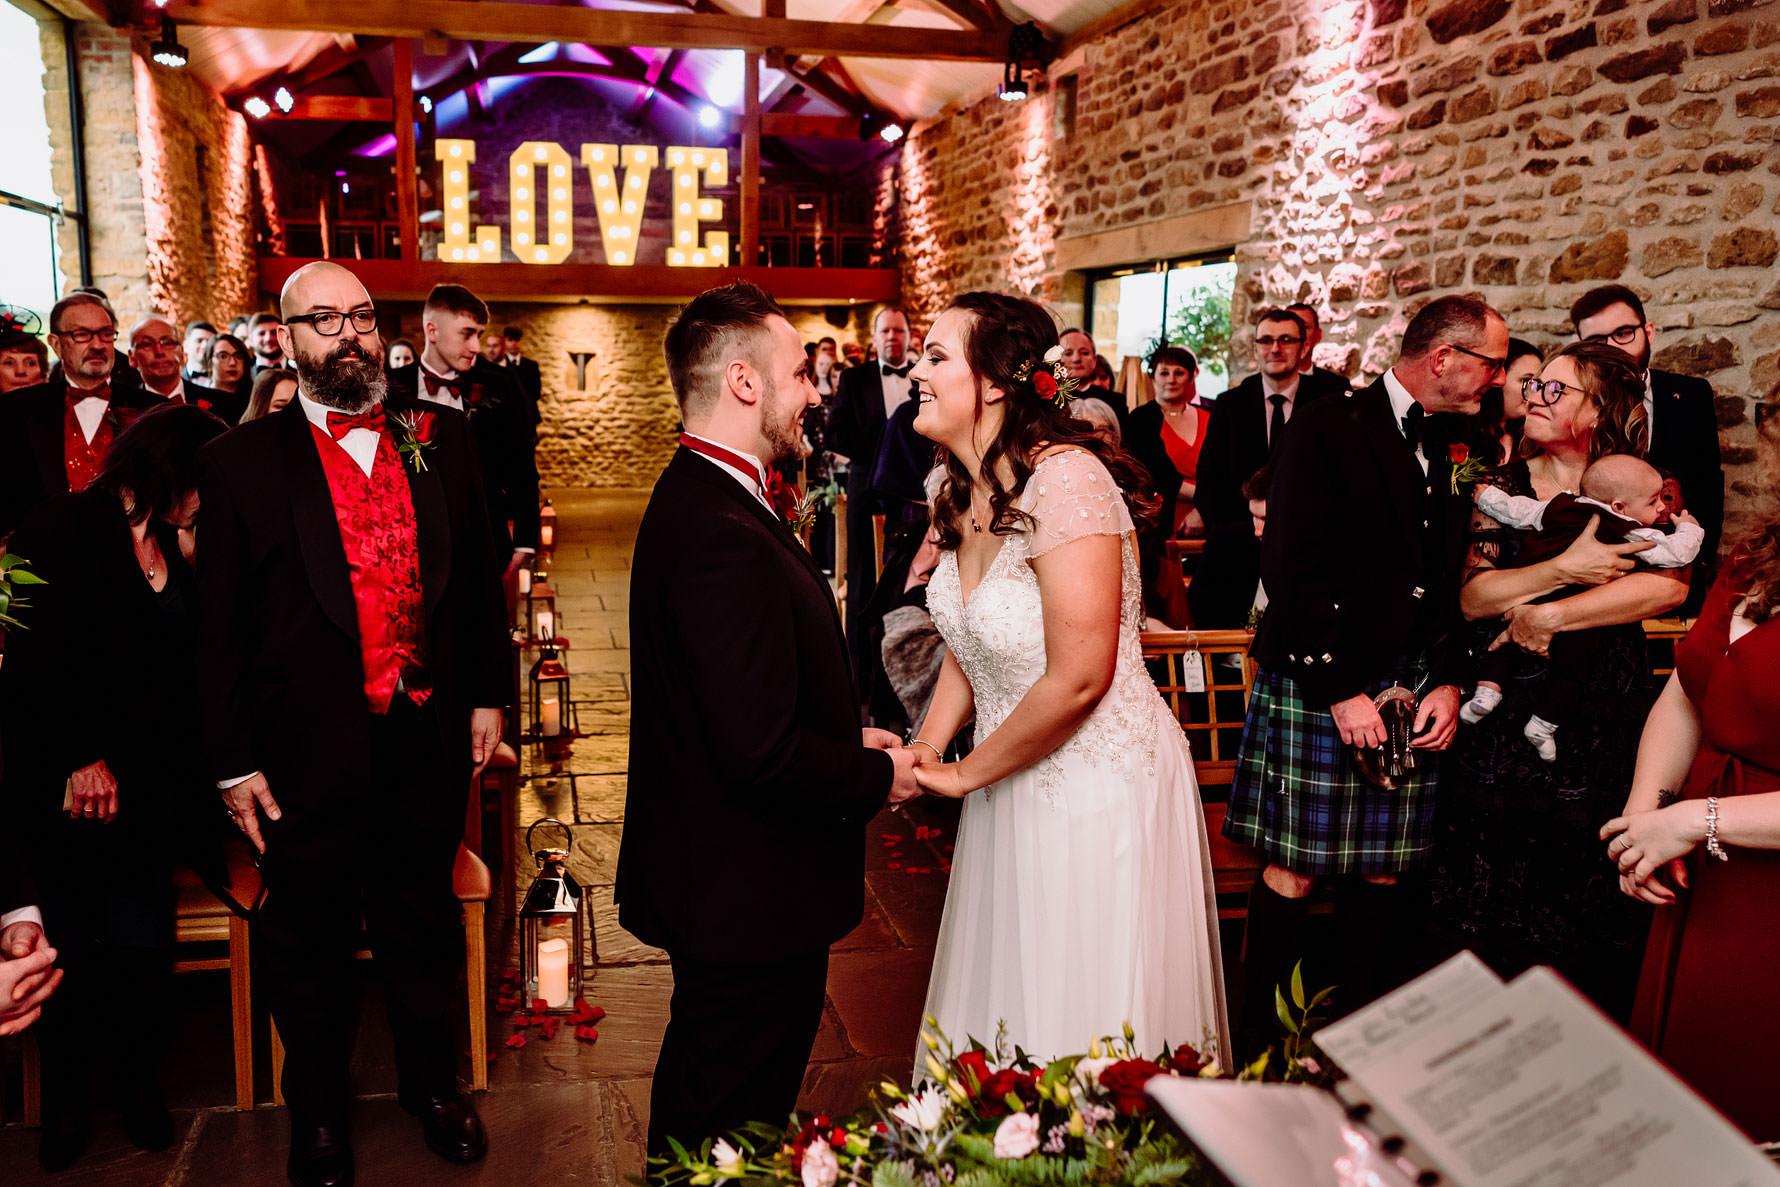 a happy bride and groom